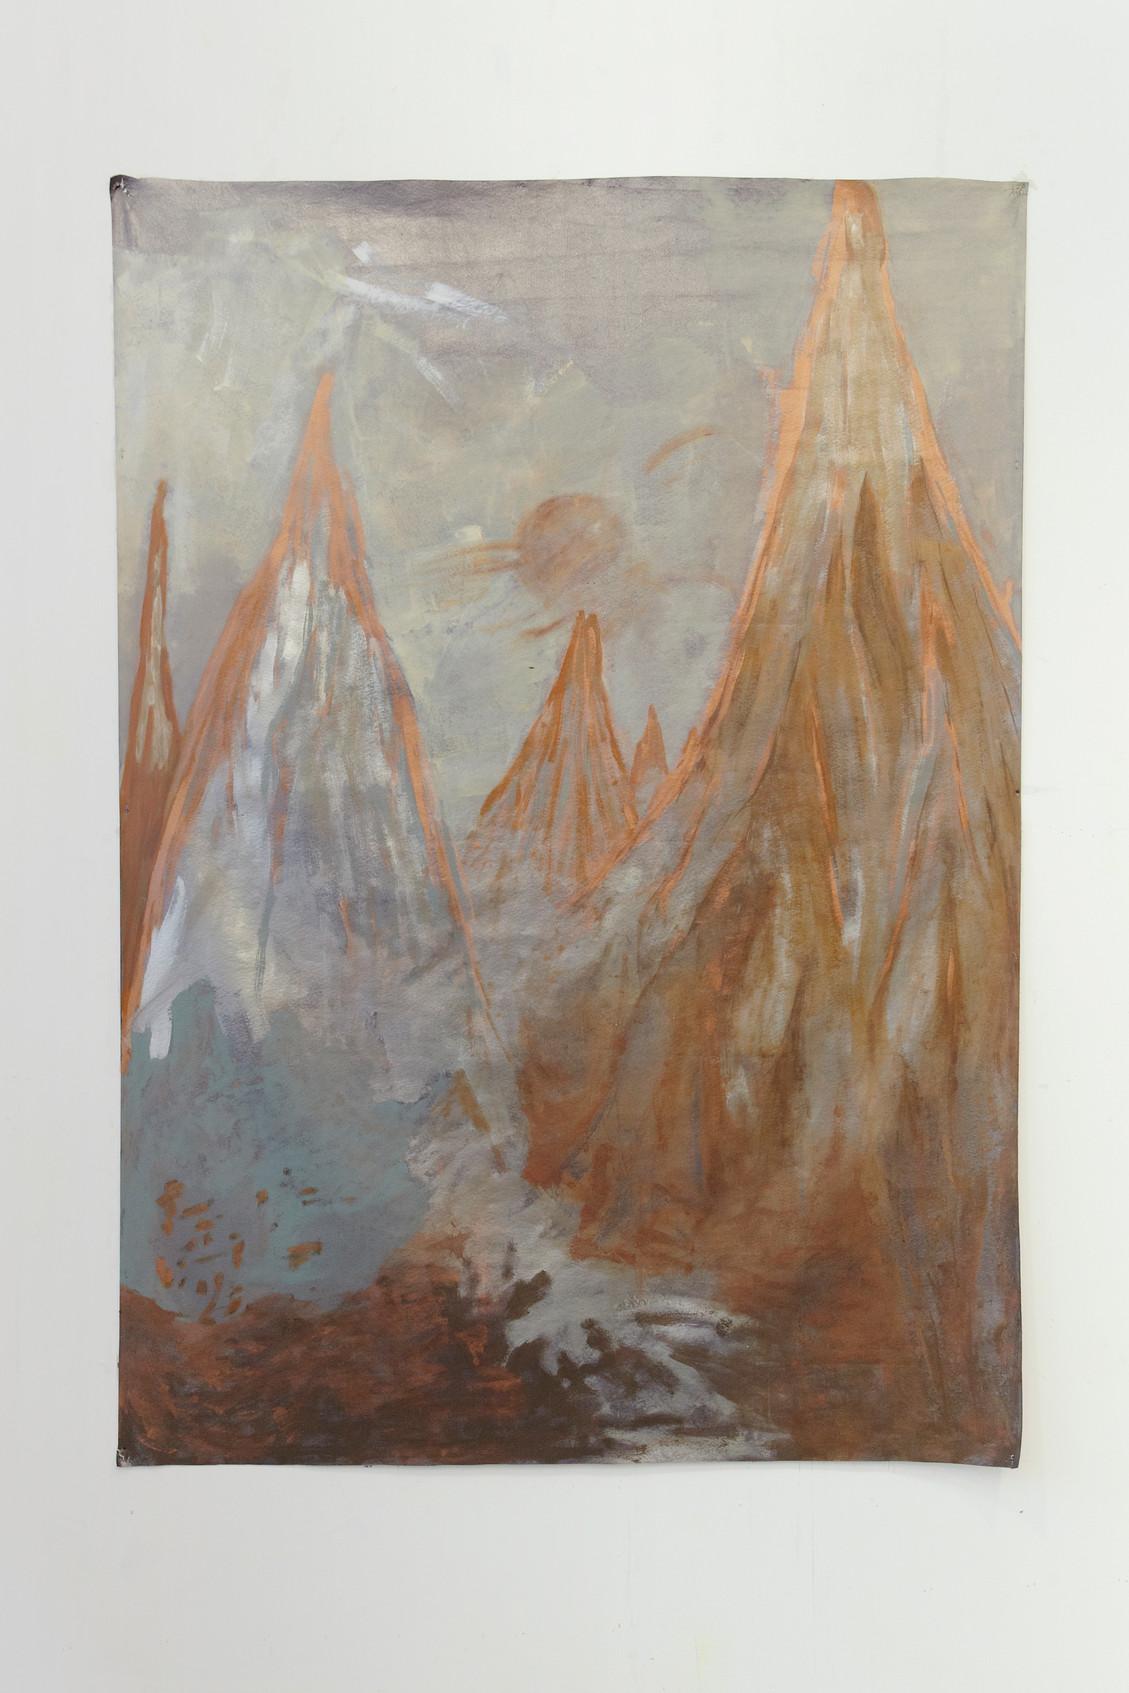 Eruption, 142 x 192 cm, enamel on sinthetic leather, 2018